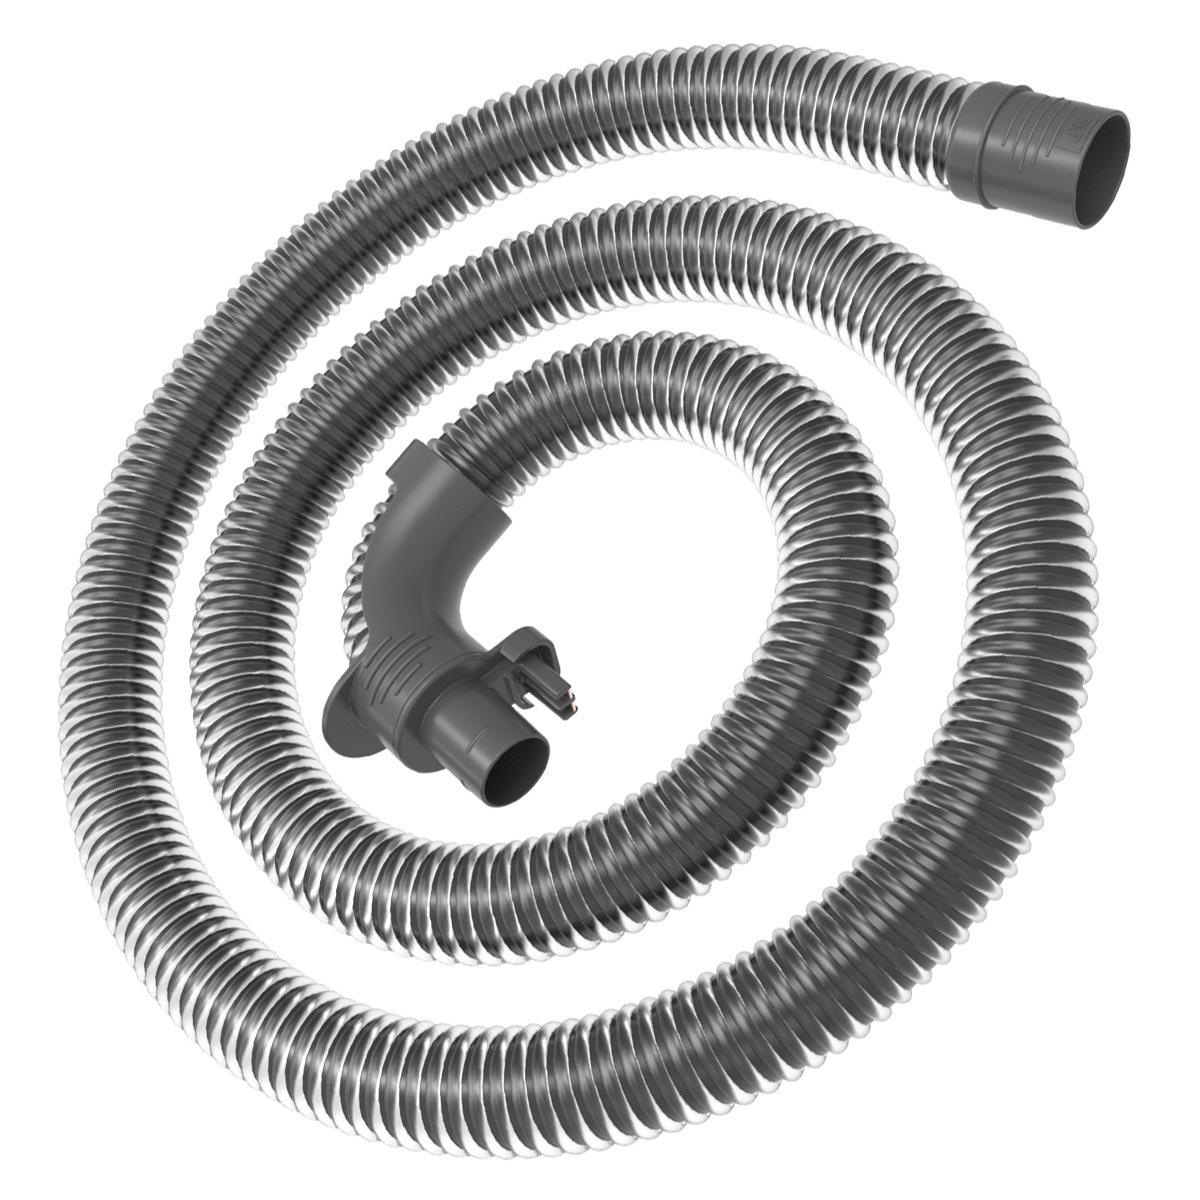 ThermoSmart AirSpiral Heated Breathing Tube SleepStyle